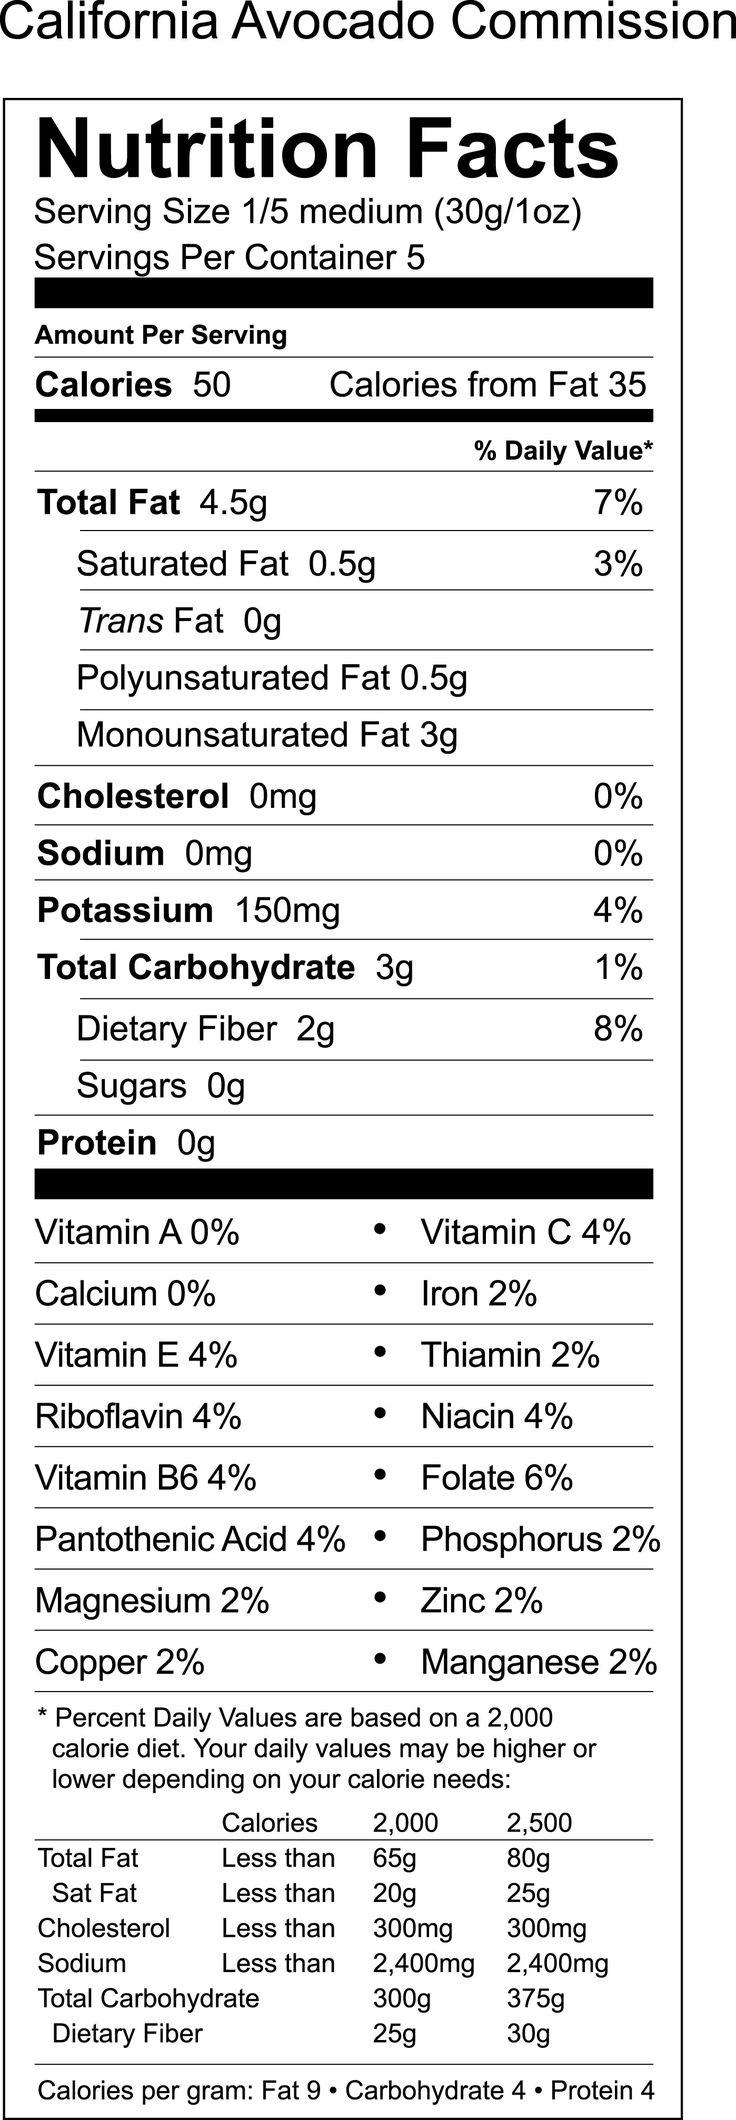 Avocado Nutritional Information   California Avocado Commission